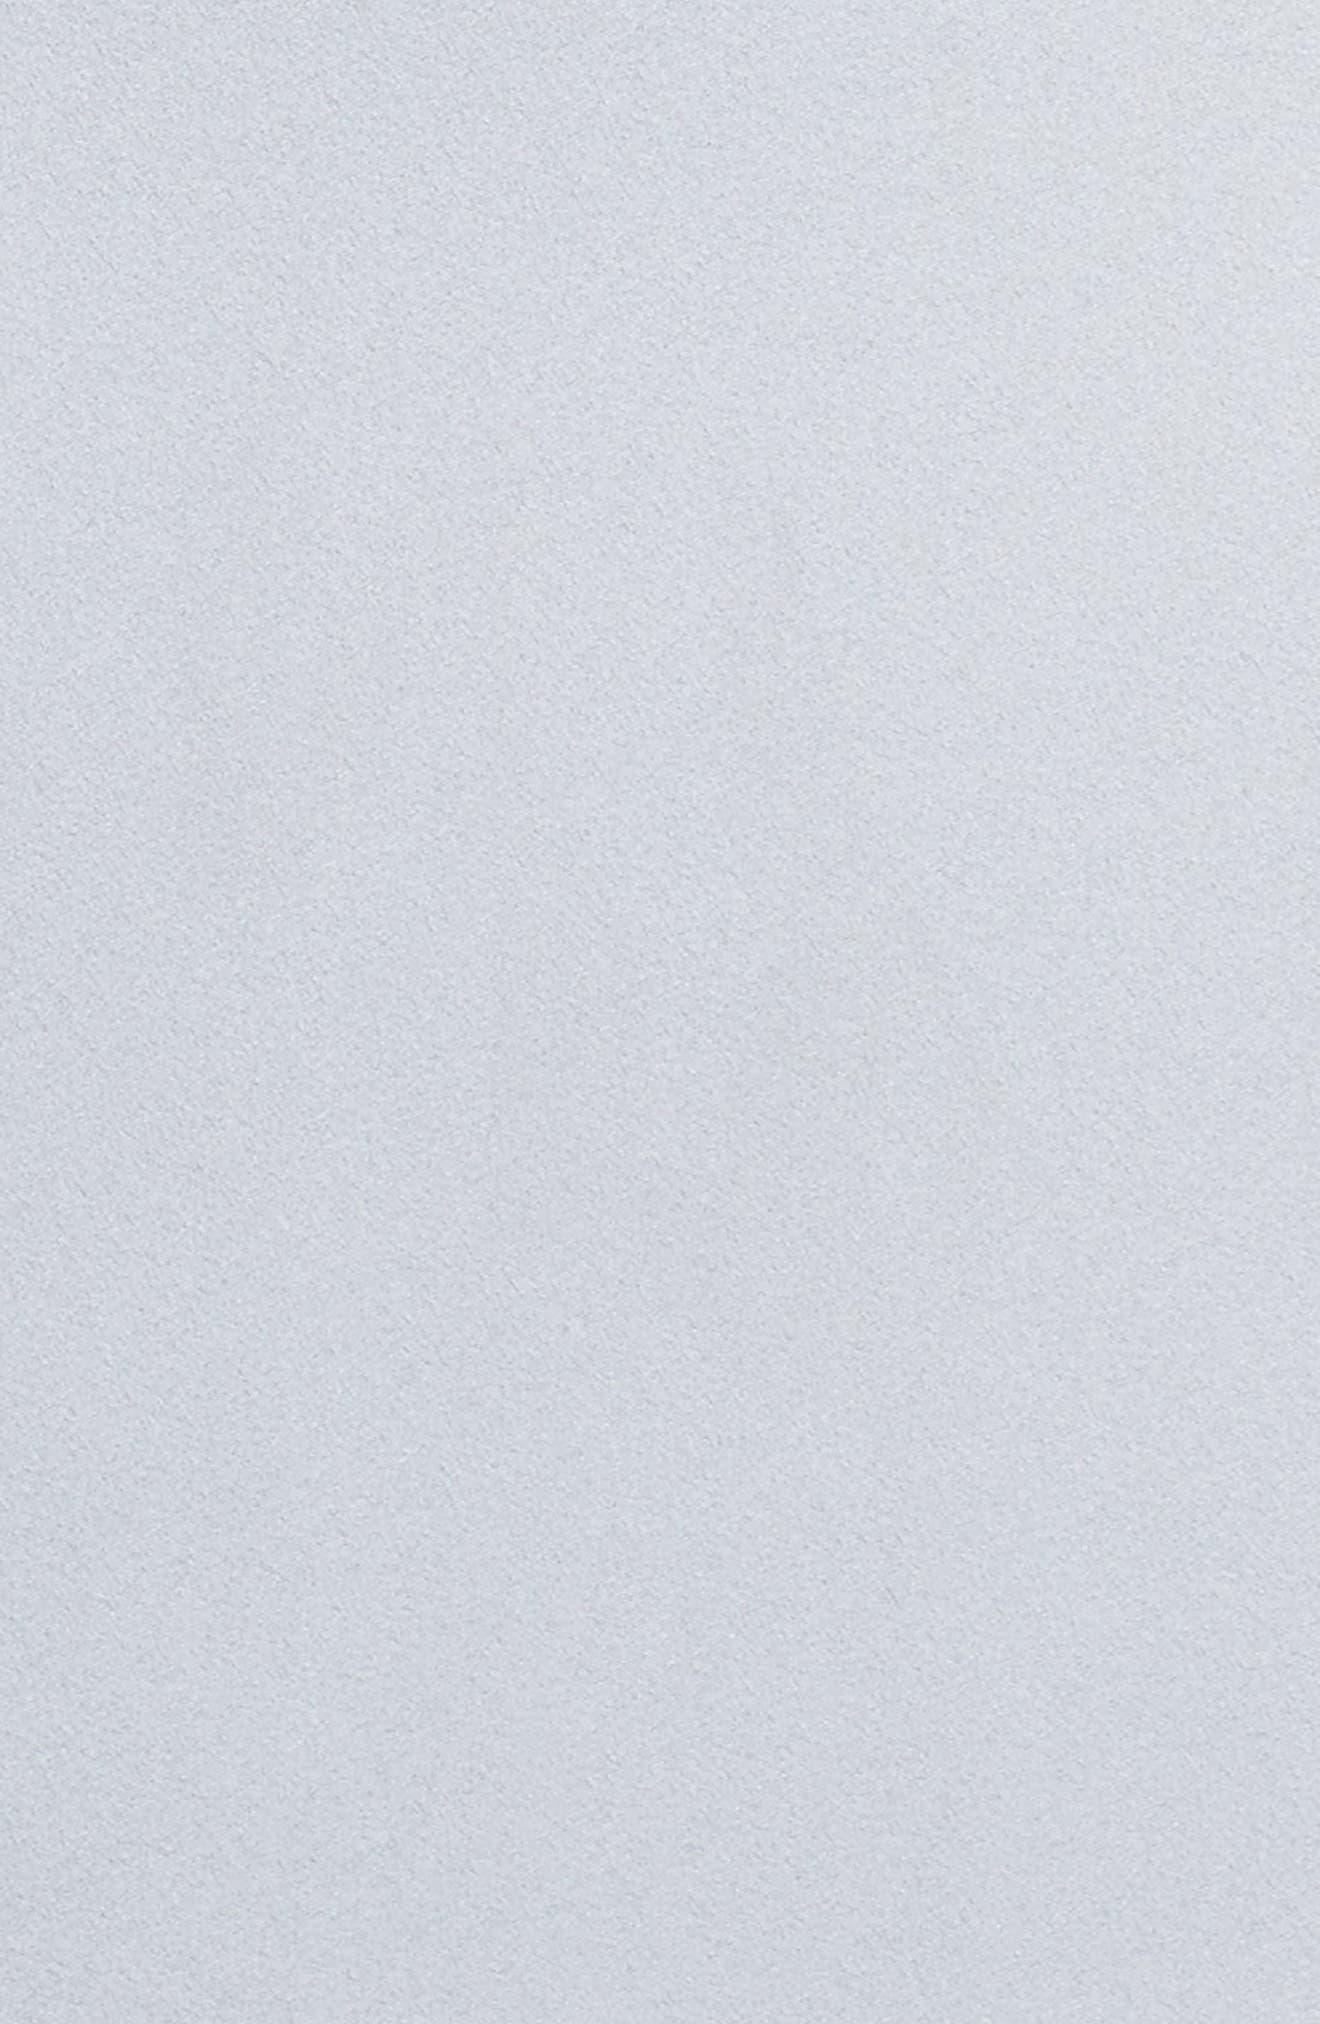 Amara Cross Back Satin Gown,                             Alternate thumbnail 5, color,                             044